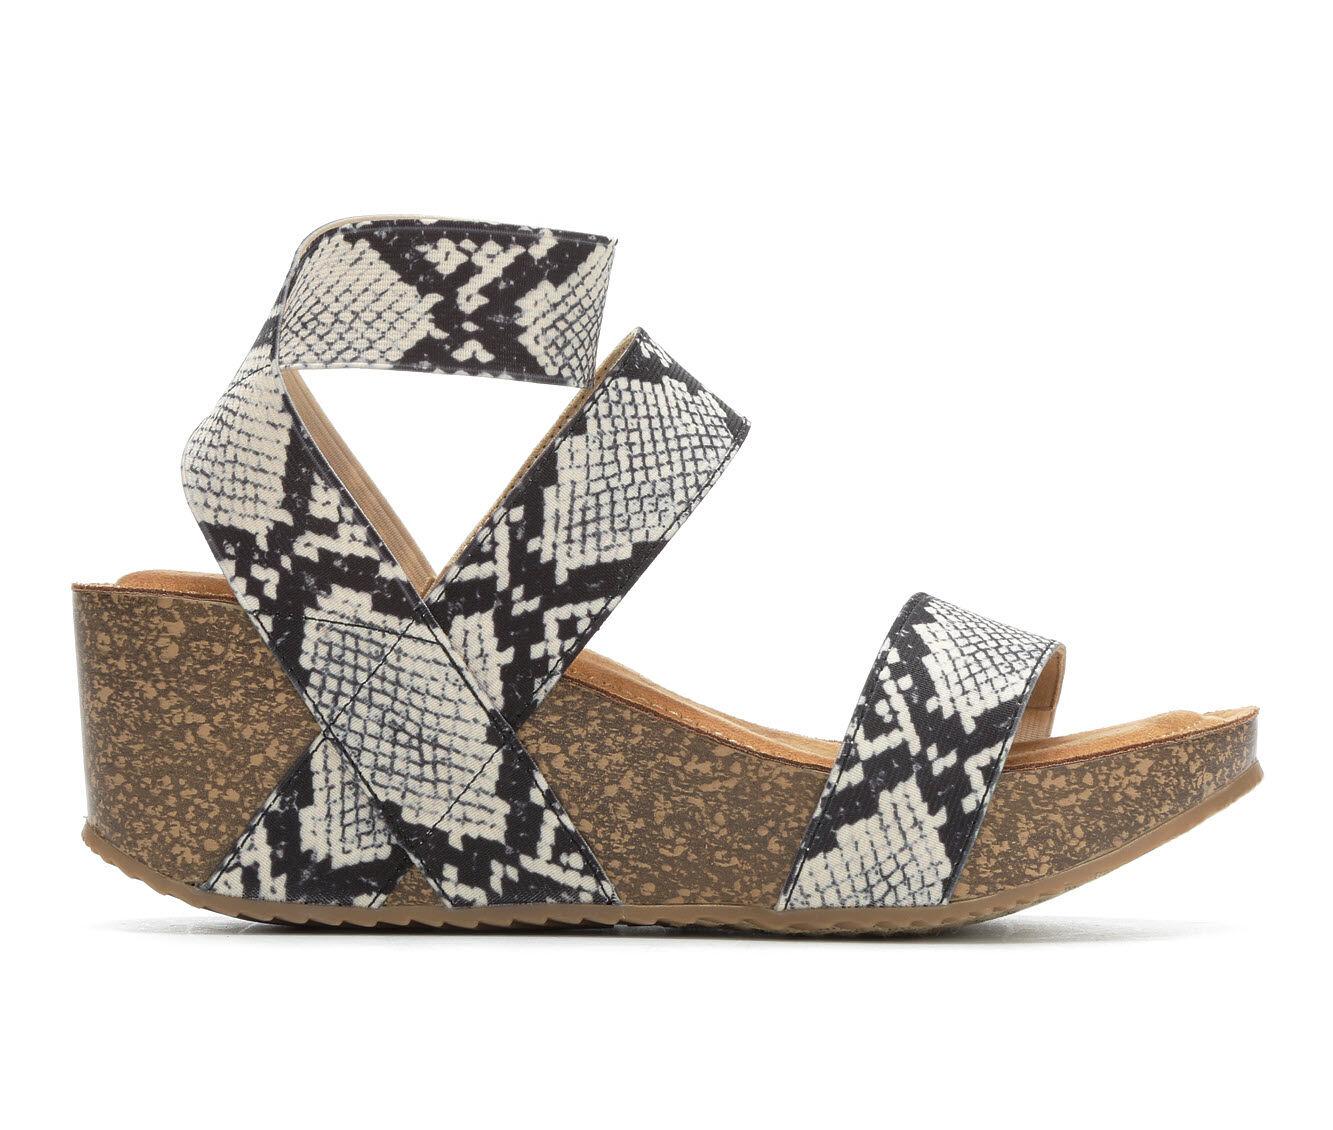 uk shoes_kd7410